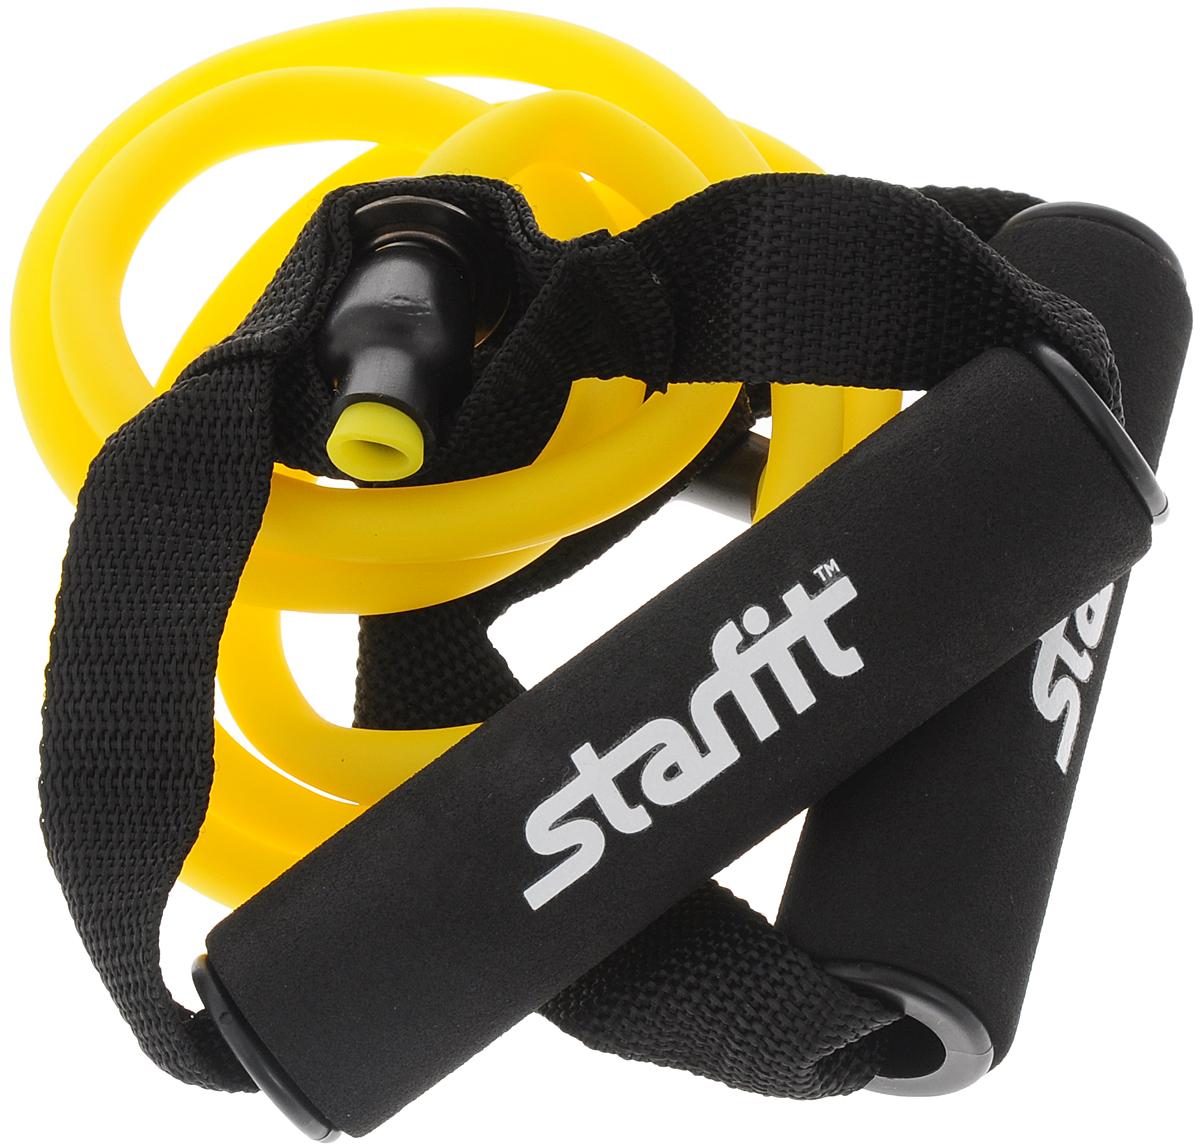 Эспандер многофункциональный Starfit ES-602, 0,6 х 0,9 х 140 см эспандер лыжника пловца starfit es 901 цвет желтый 0 6 х 0 9 х 140 см 2 кг